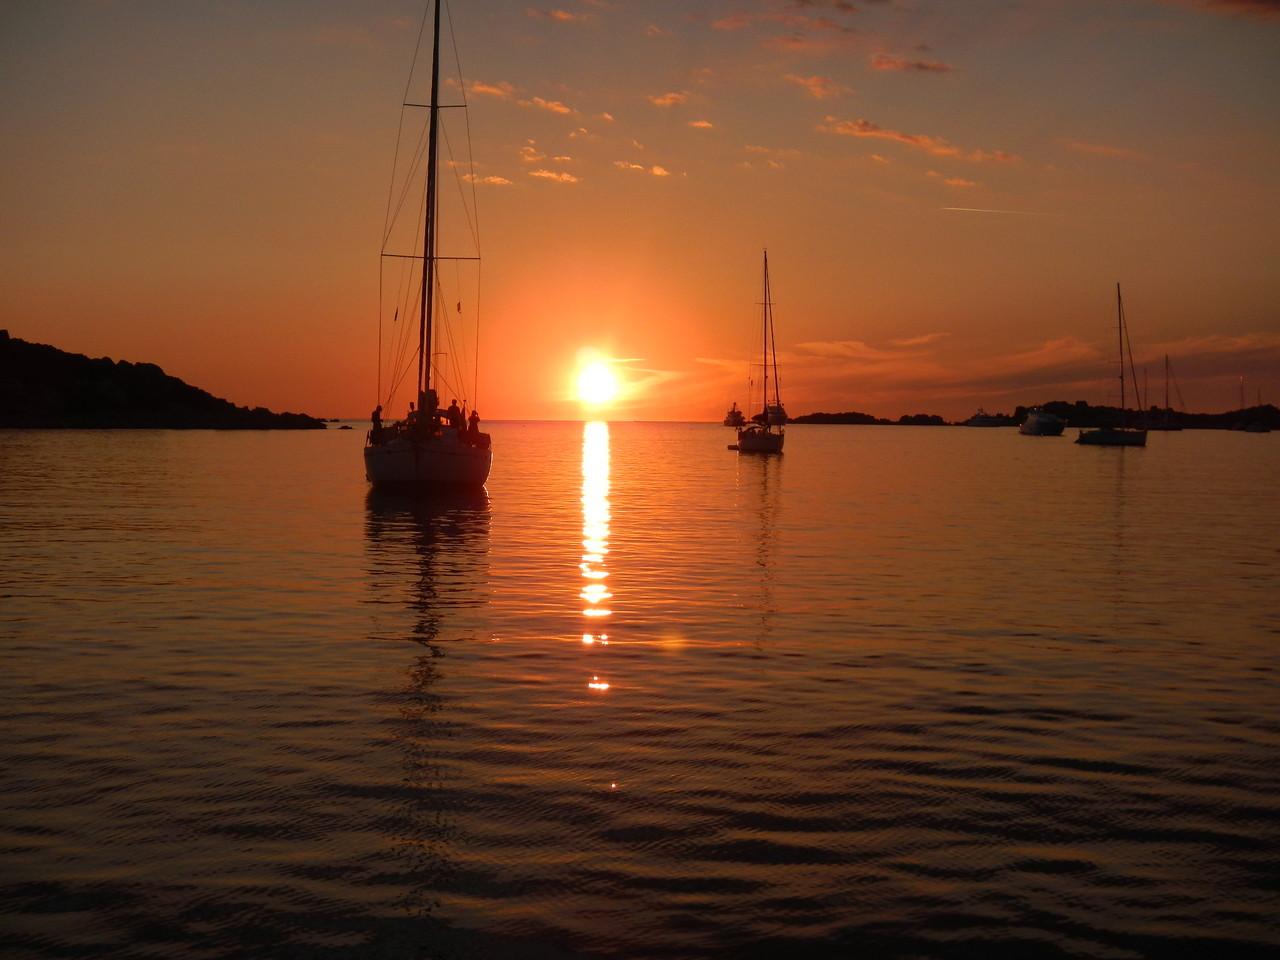 Sonnenuntergang im Inseldreieck, das Maddalena Archipel romantisch